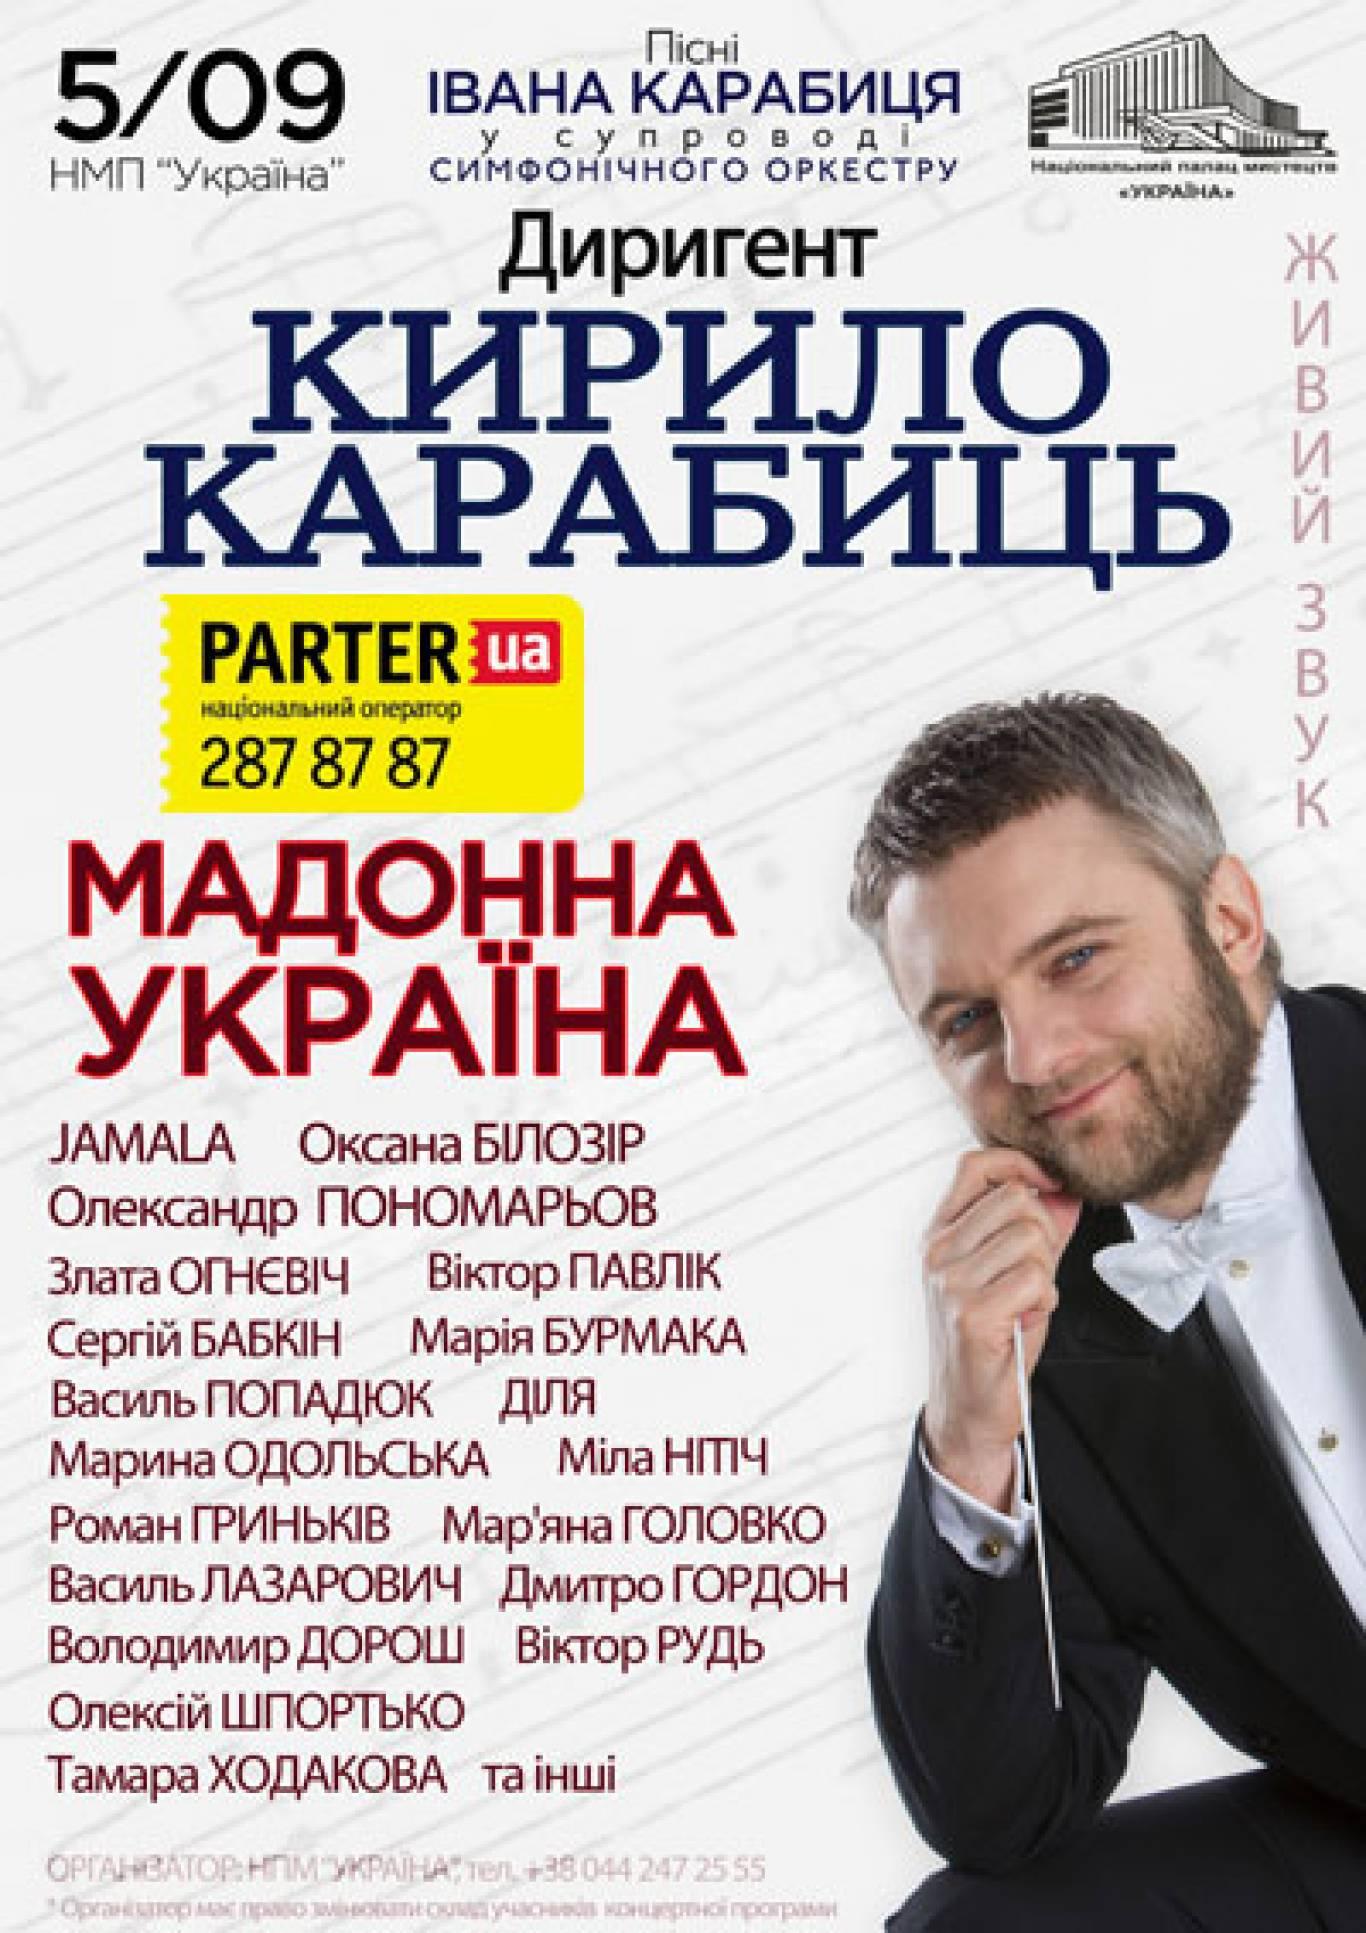 Кирило Карабиць та симфонічний оркестр: концерт «Мадонна Україна»